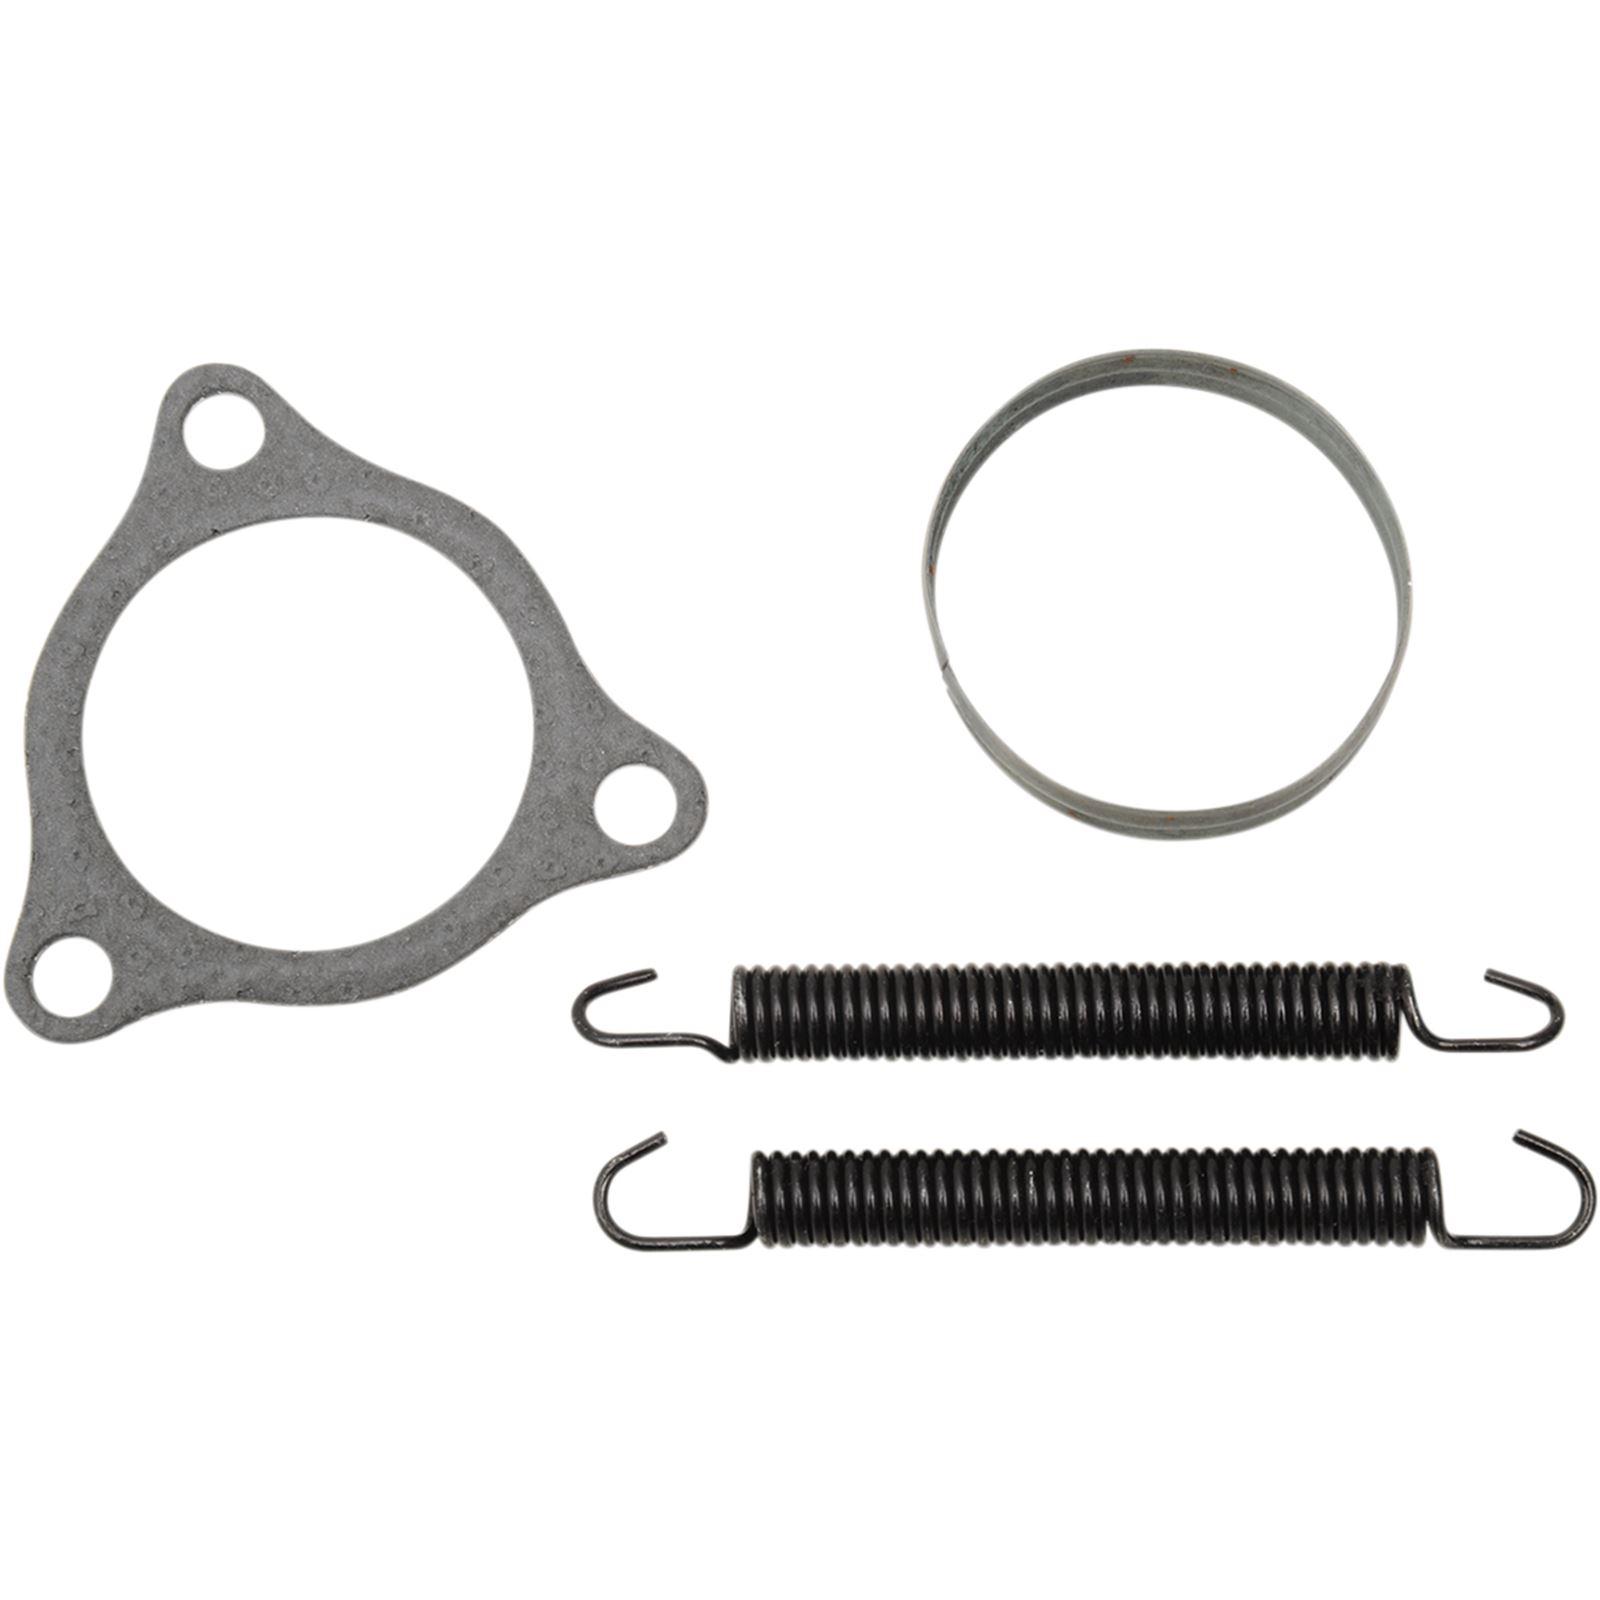 Moose Racing Exhaust Gasket Kit